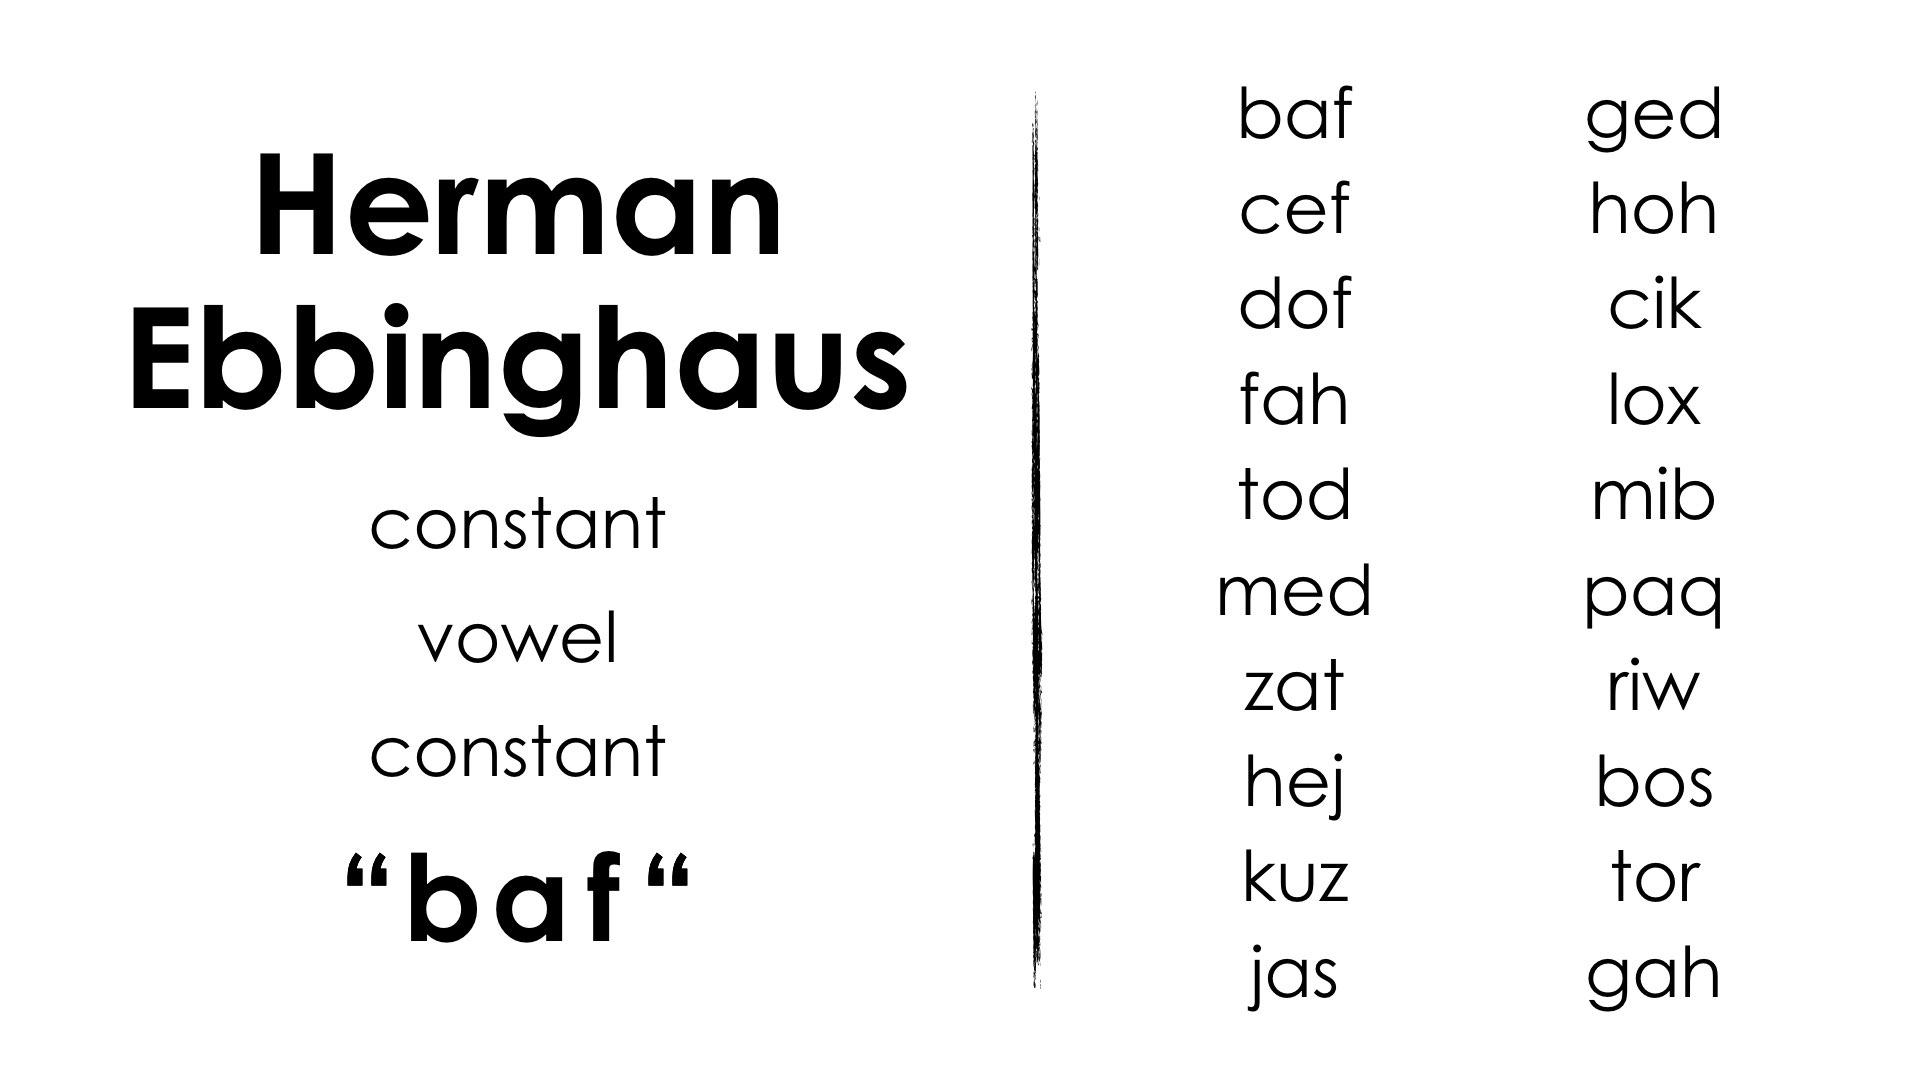 Spiralling Your Math Curriculum - Herman Ebbinghaus List of Nonsensical Words